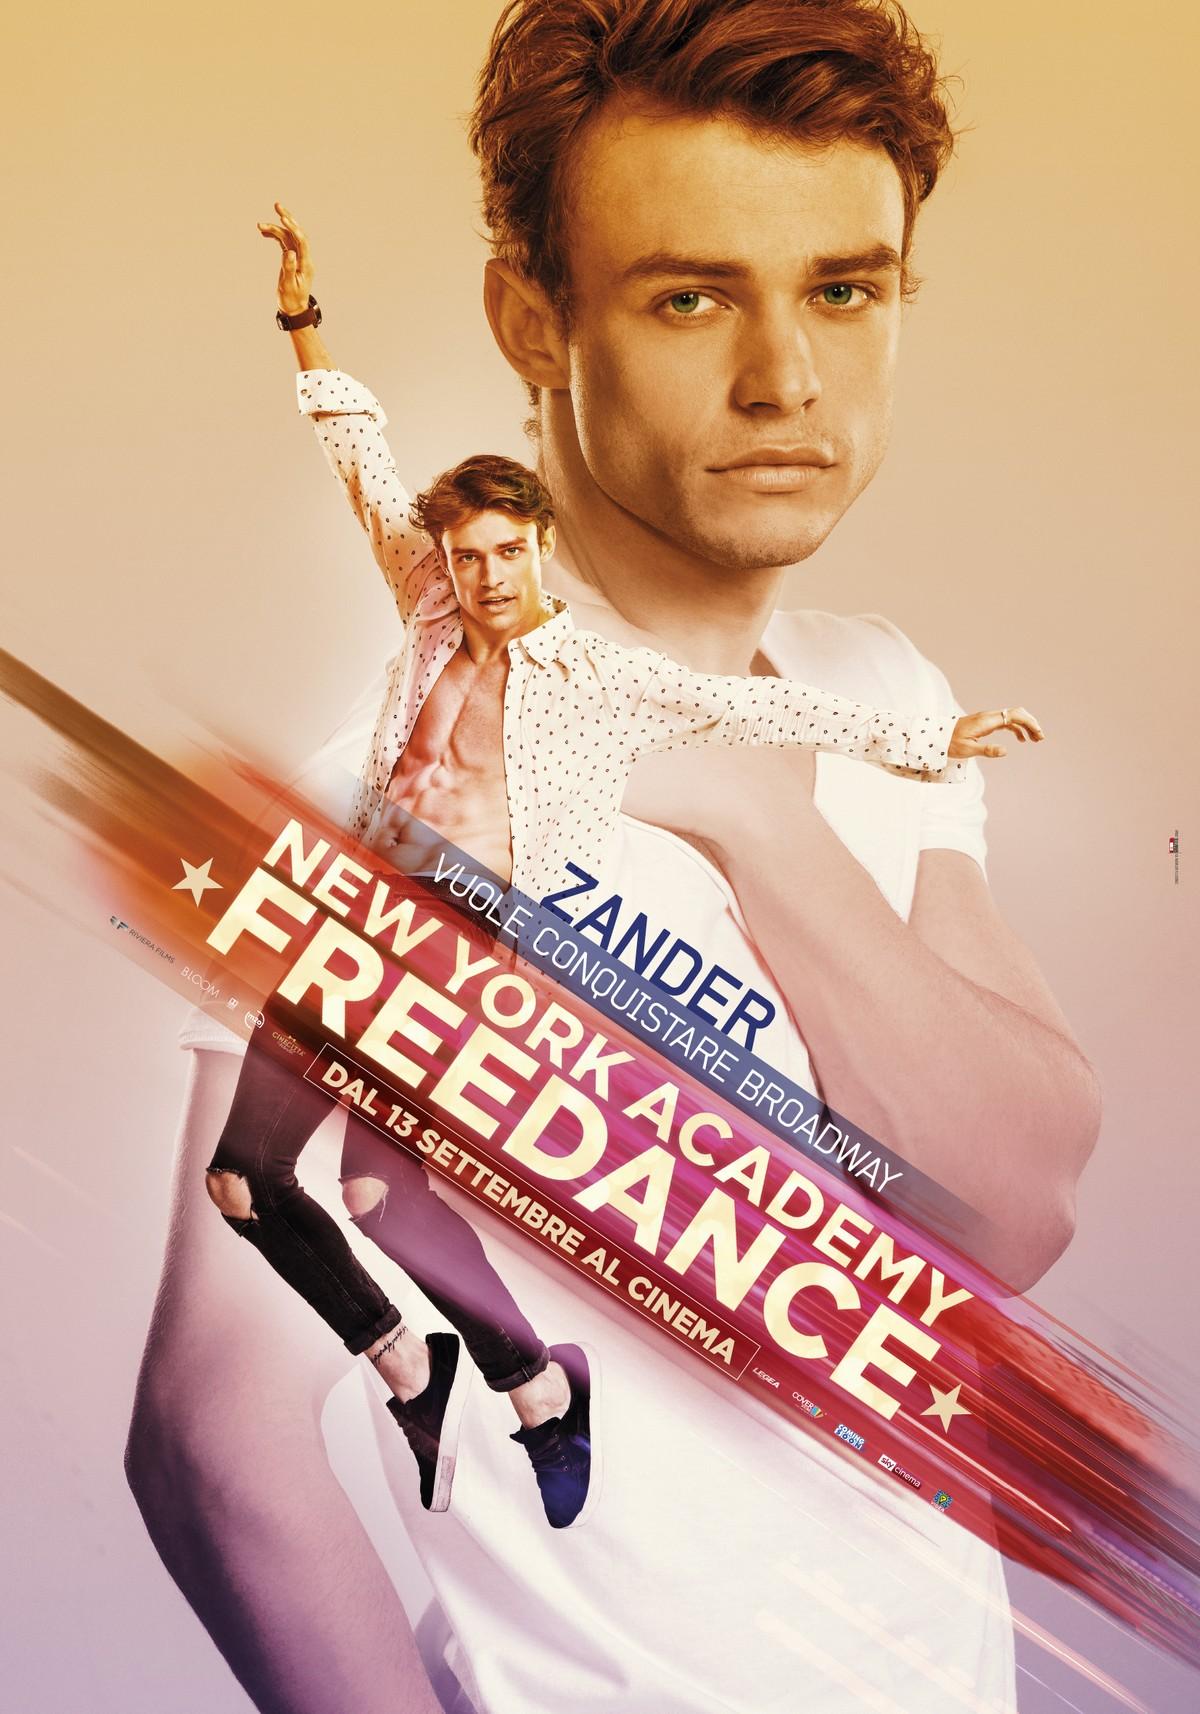 New York Academy Freedance 2018